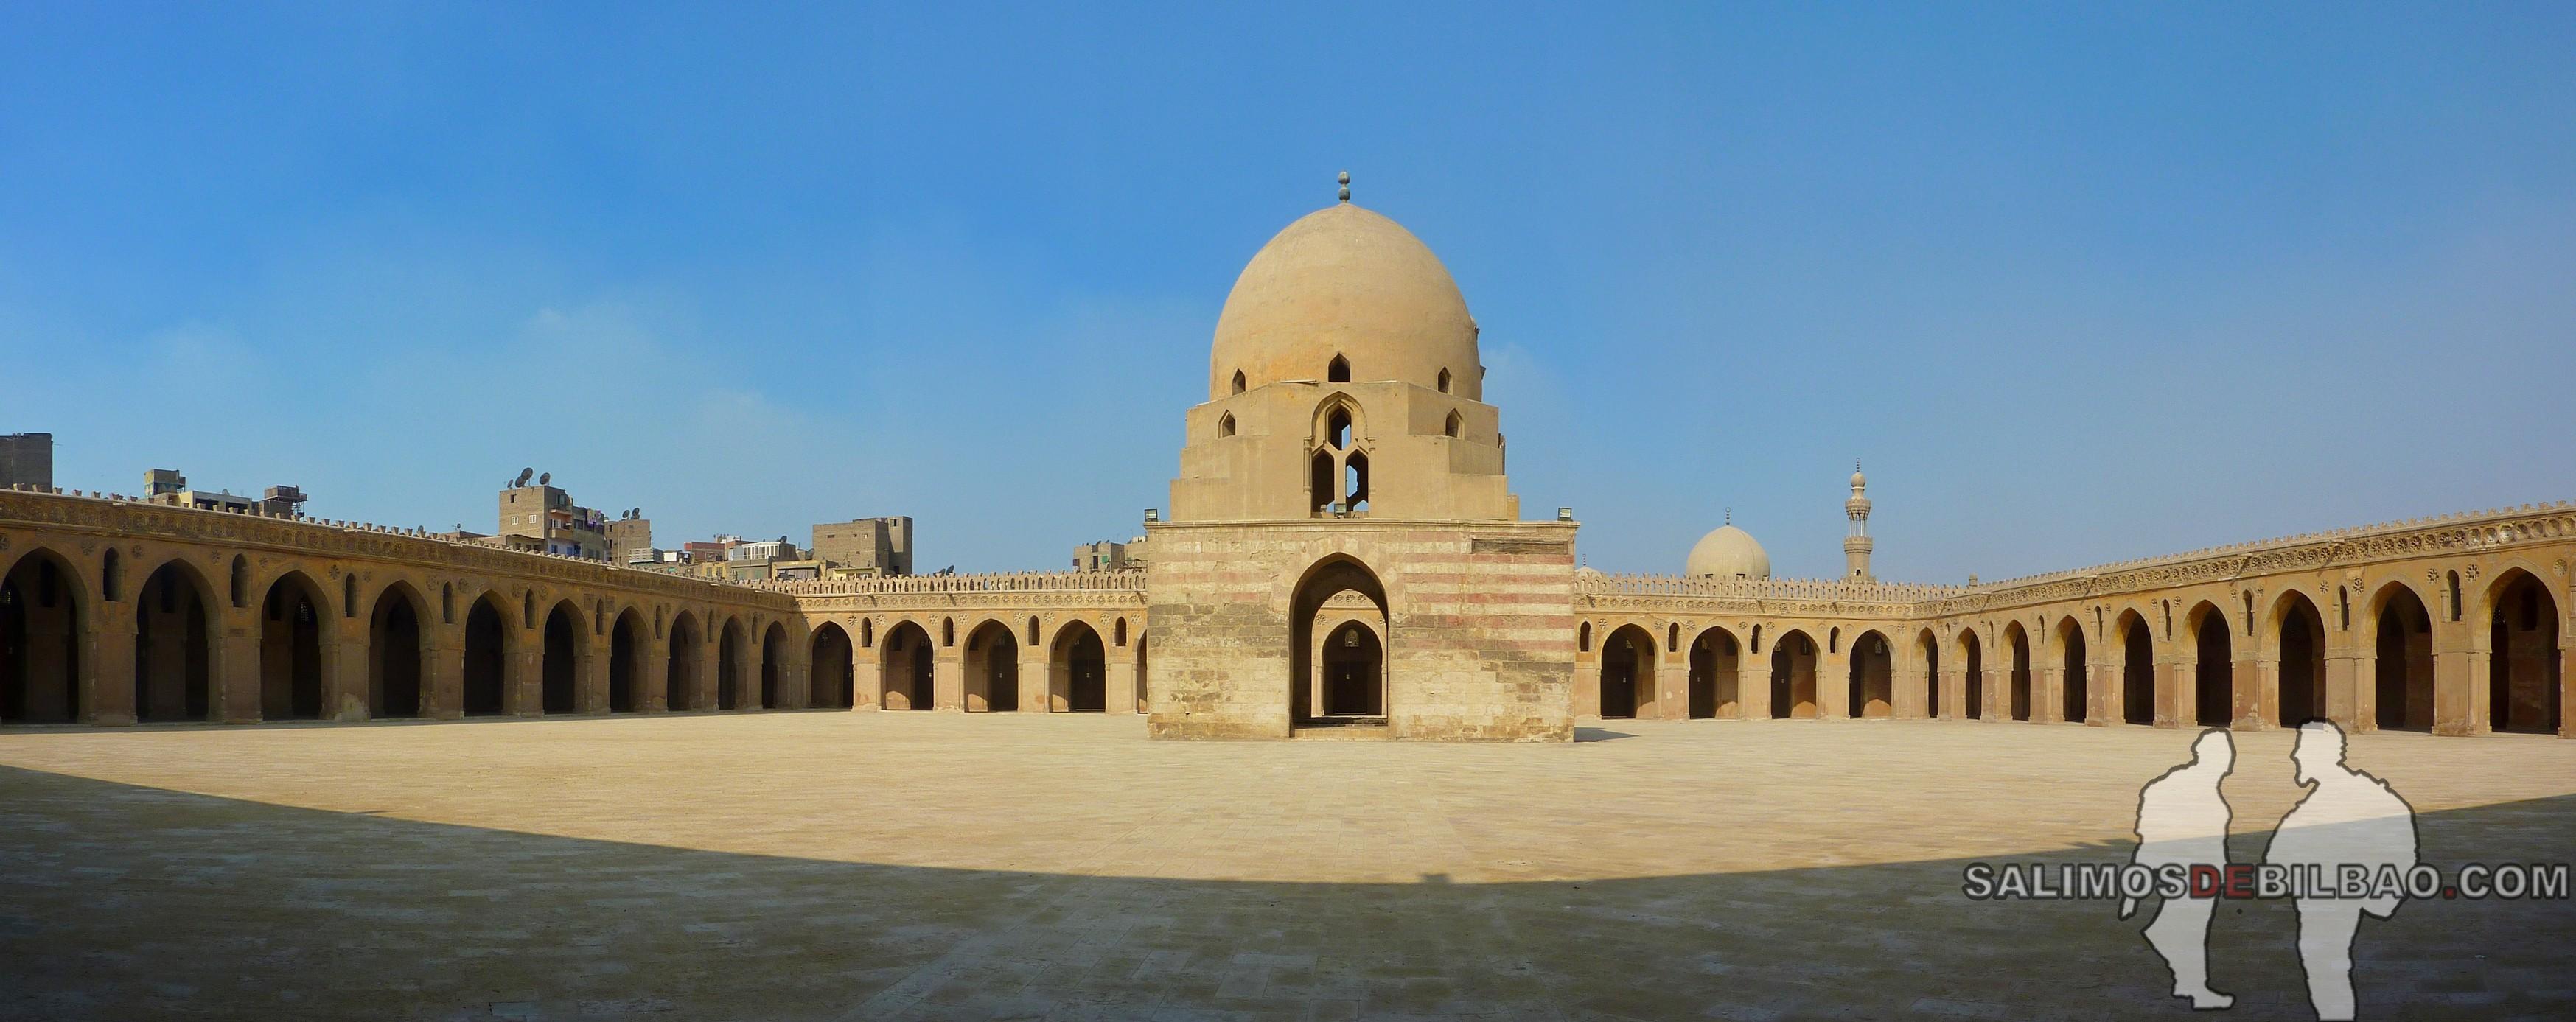 0012. Pano, Mezquita de Ahmad Ibn Tulun, Cairo